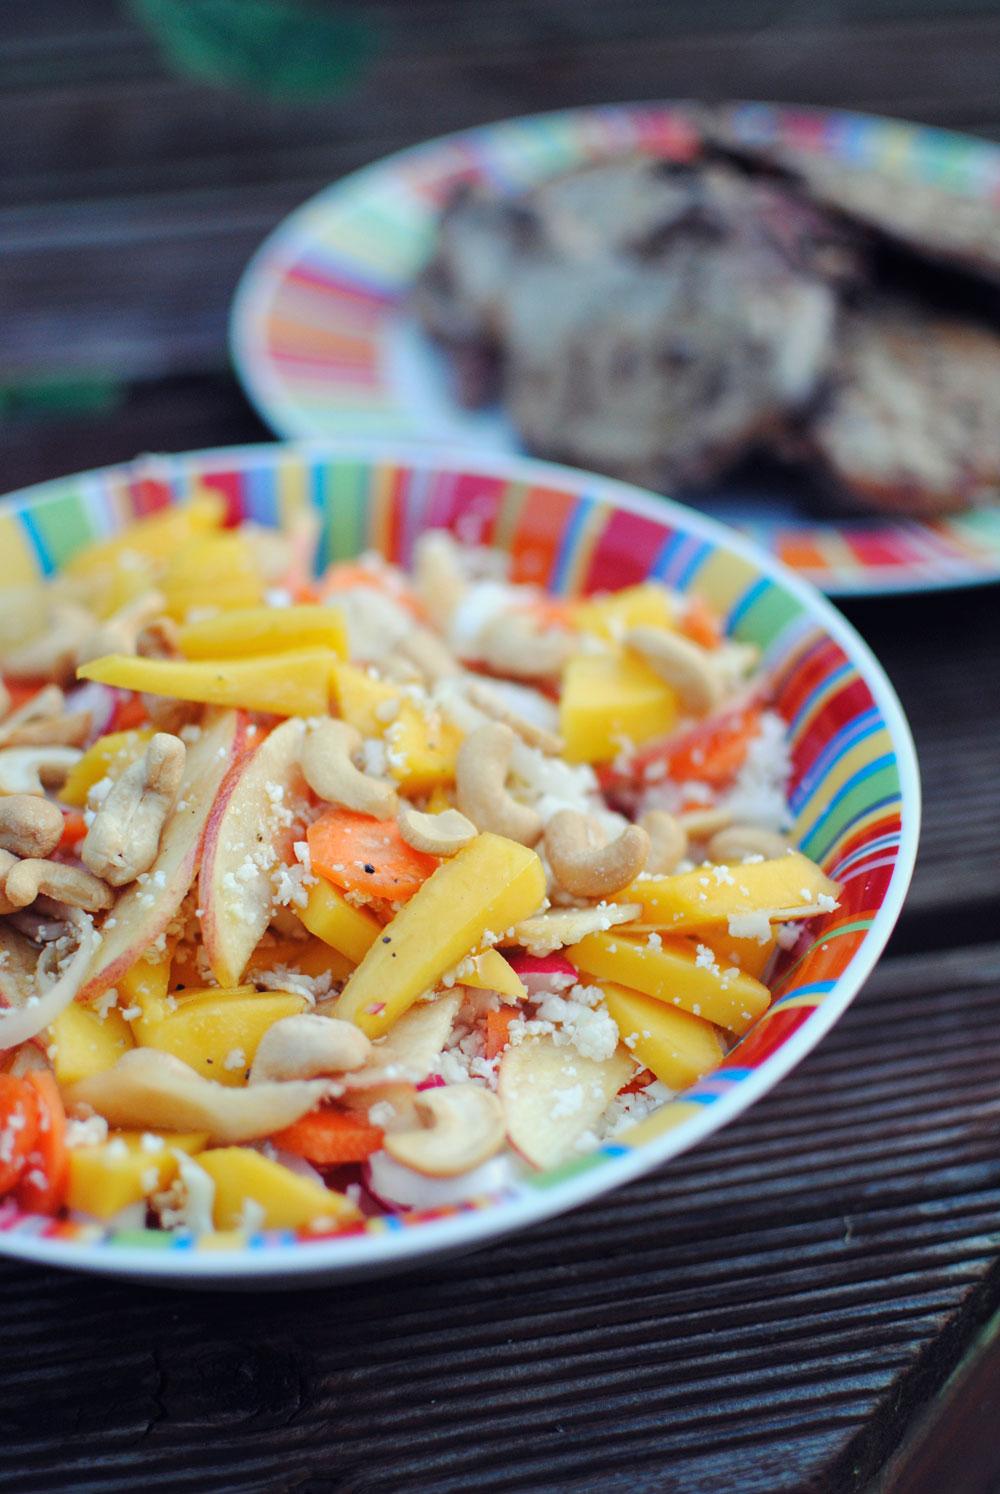 Opskrift: Blomkålscouscous med mango og radiser | Frk. Kræsen